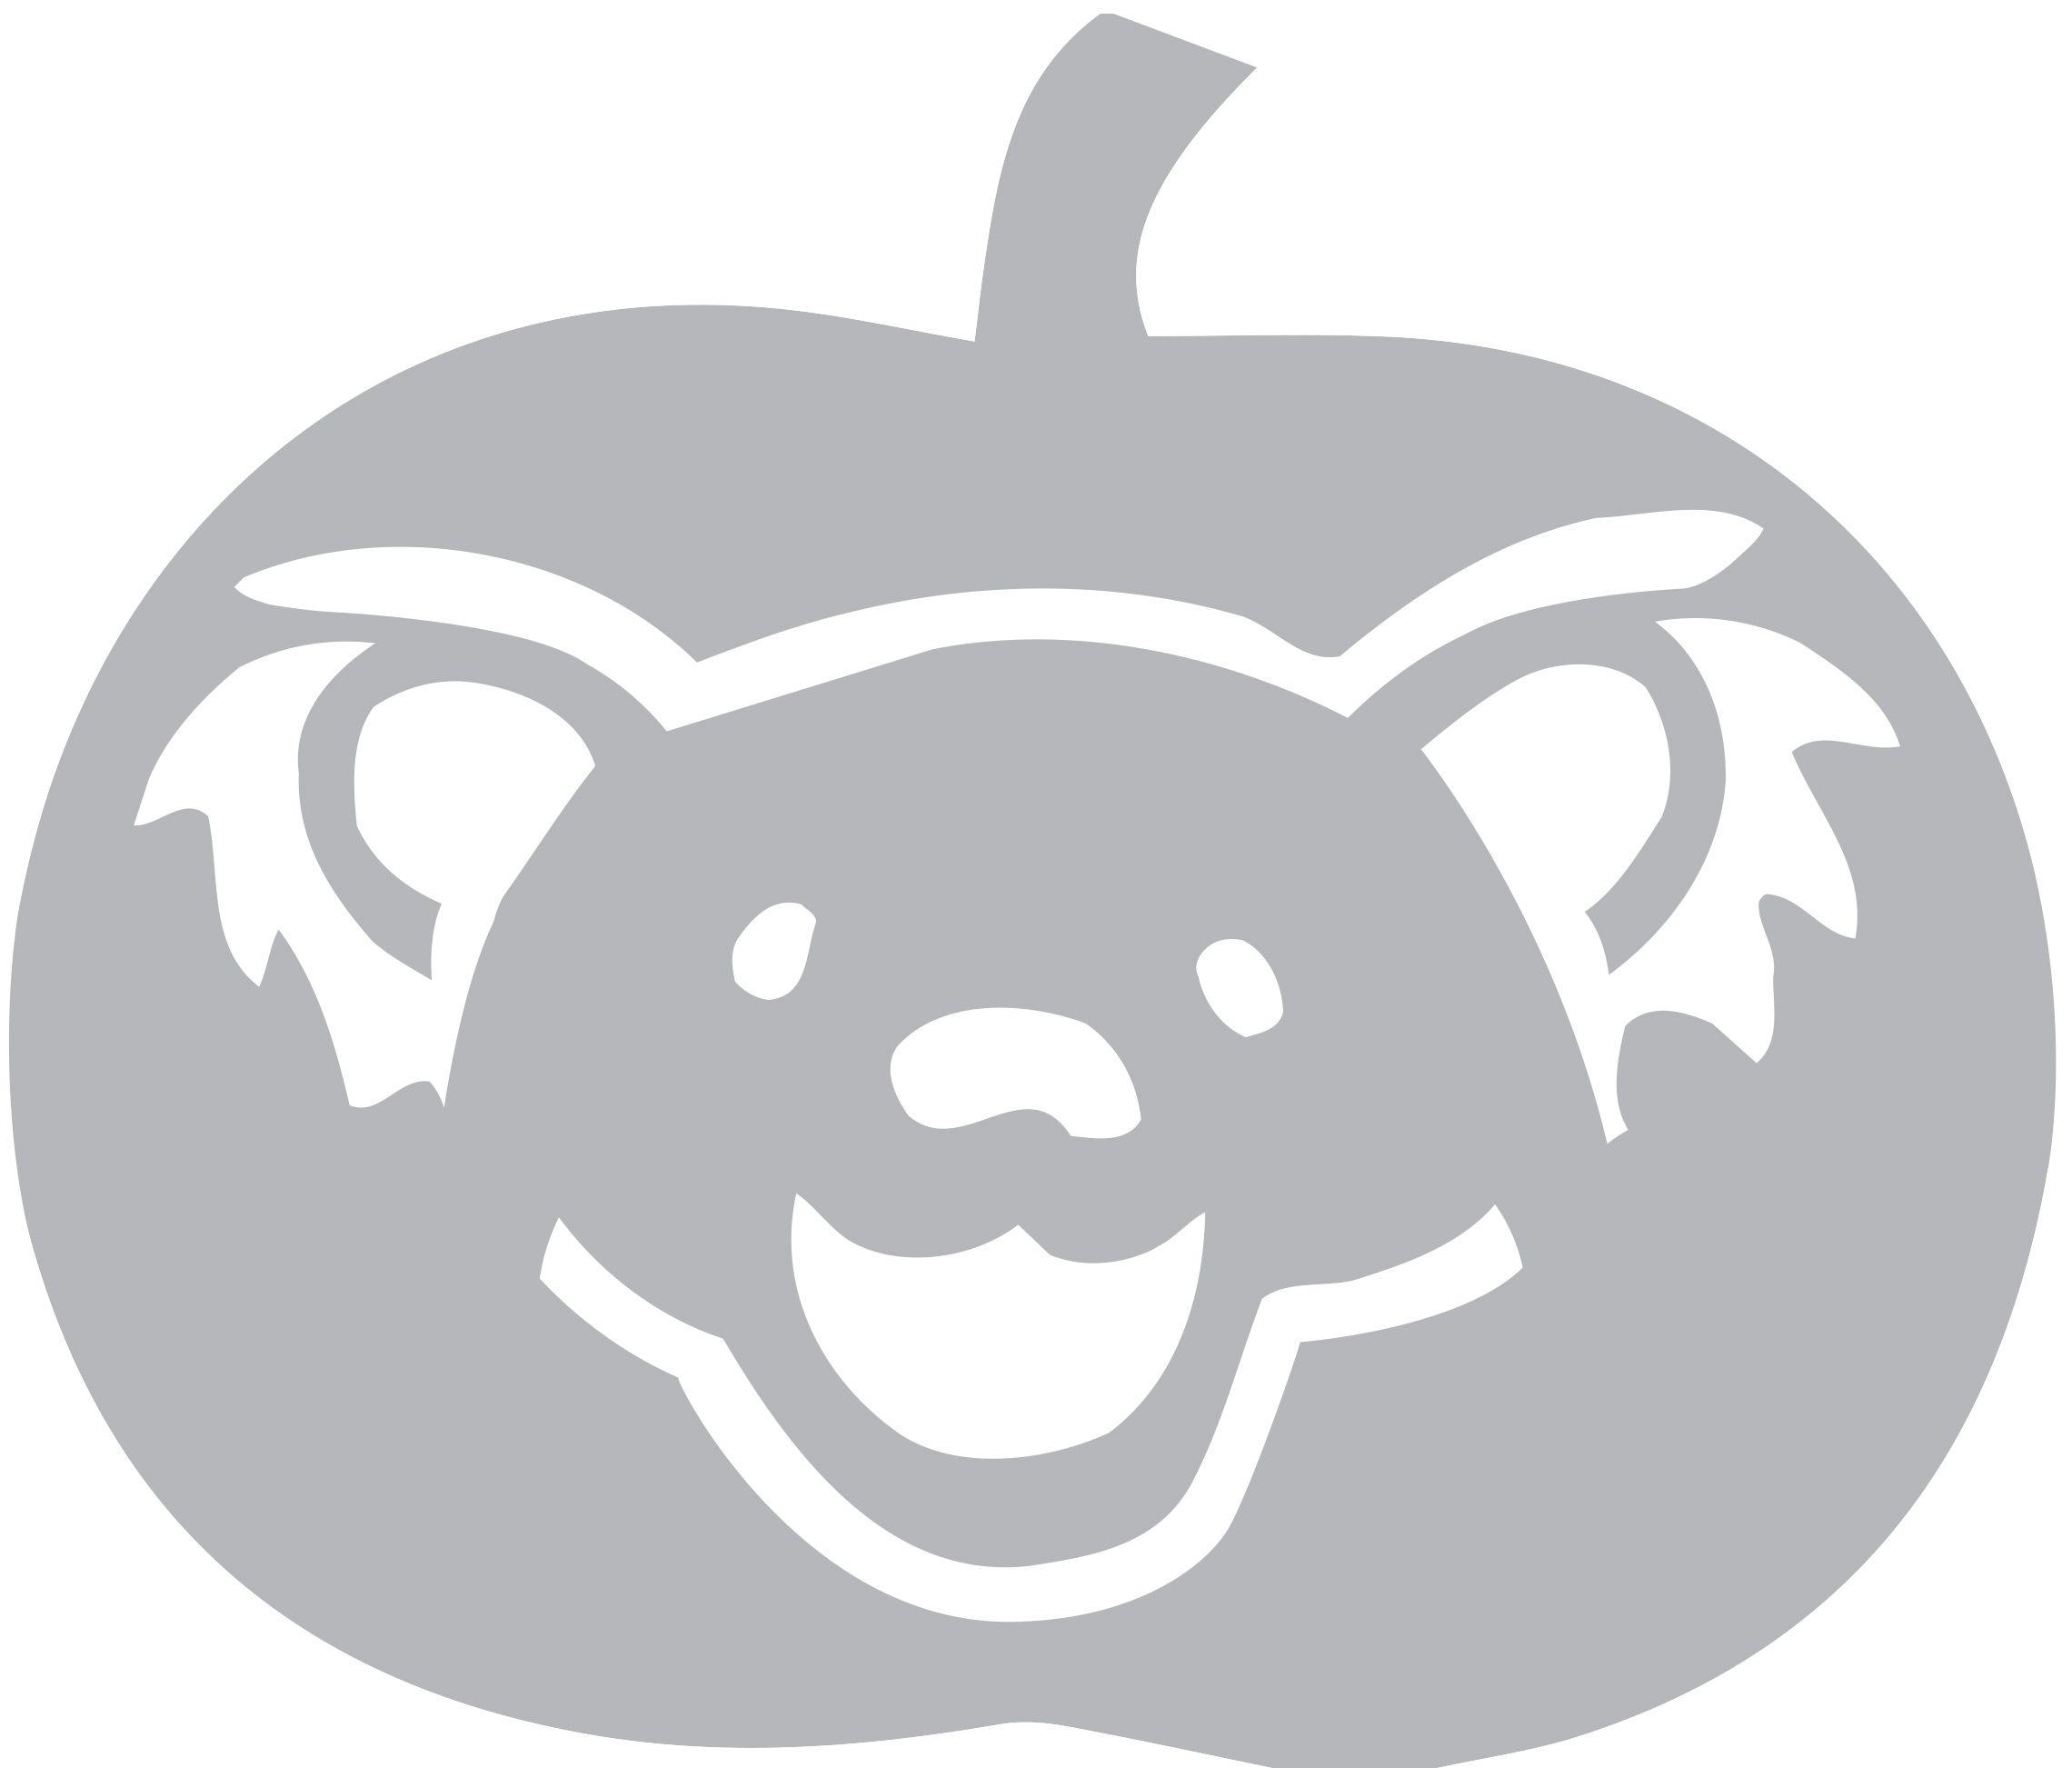 Grateful Dead Pumpkin Stencils | Grateful Dead … | Pinteres…